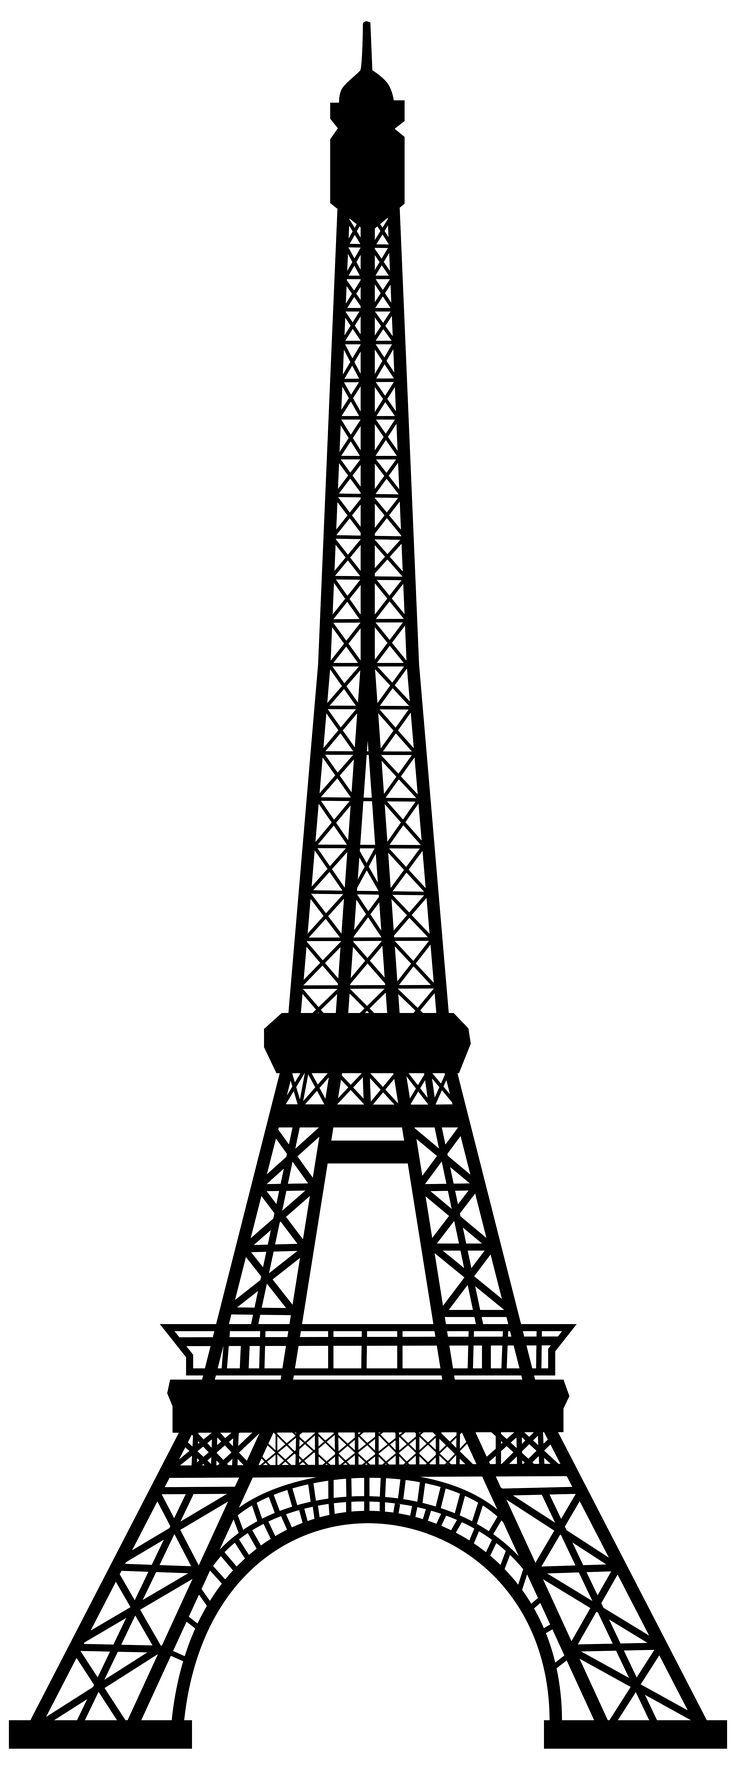 Transparent Eiffel Tower Silhouette Png Clip Art Image Torre Eiffel Desenho Molde Torre Eiffel Torre Eiffel